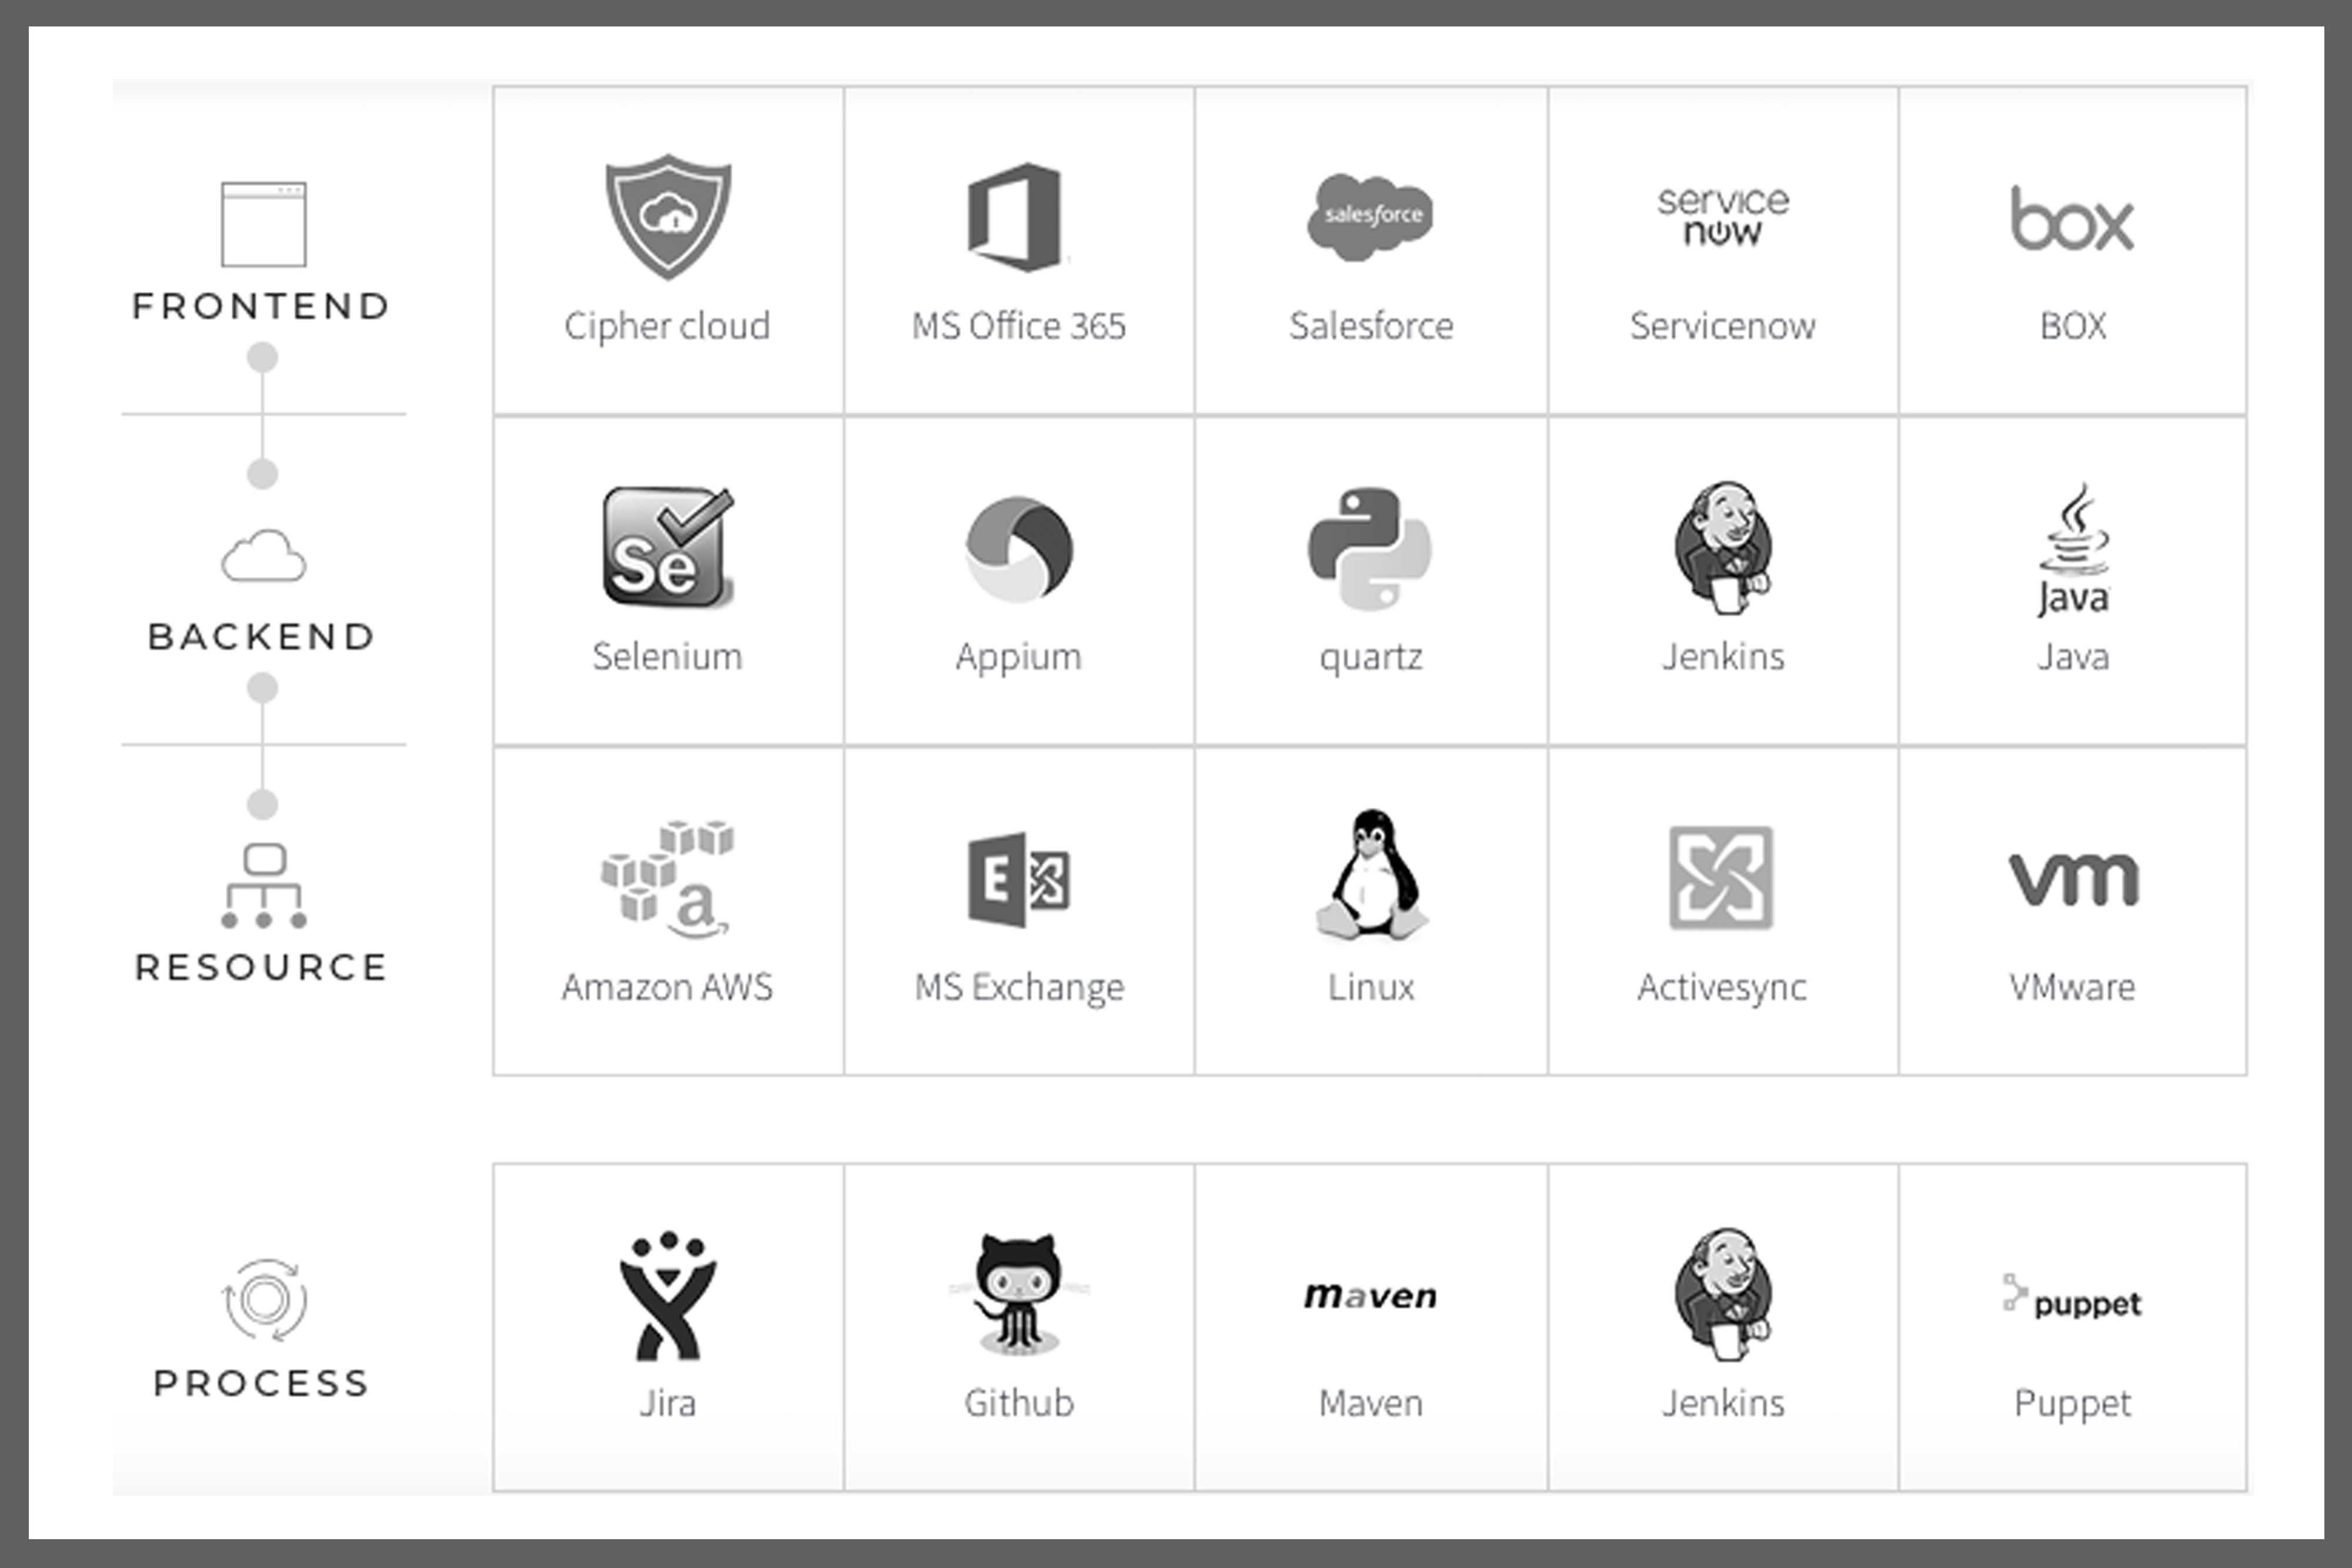 Mobile App Testing - Zymr